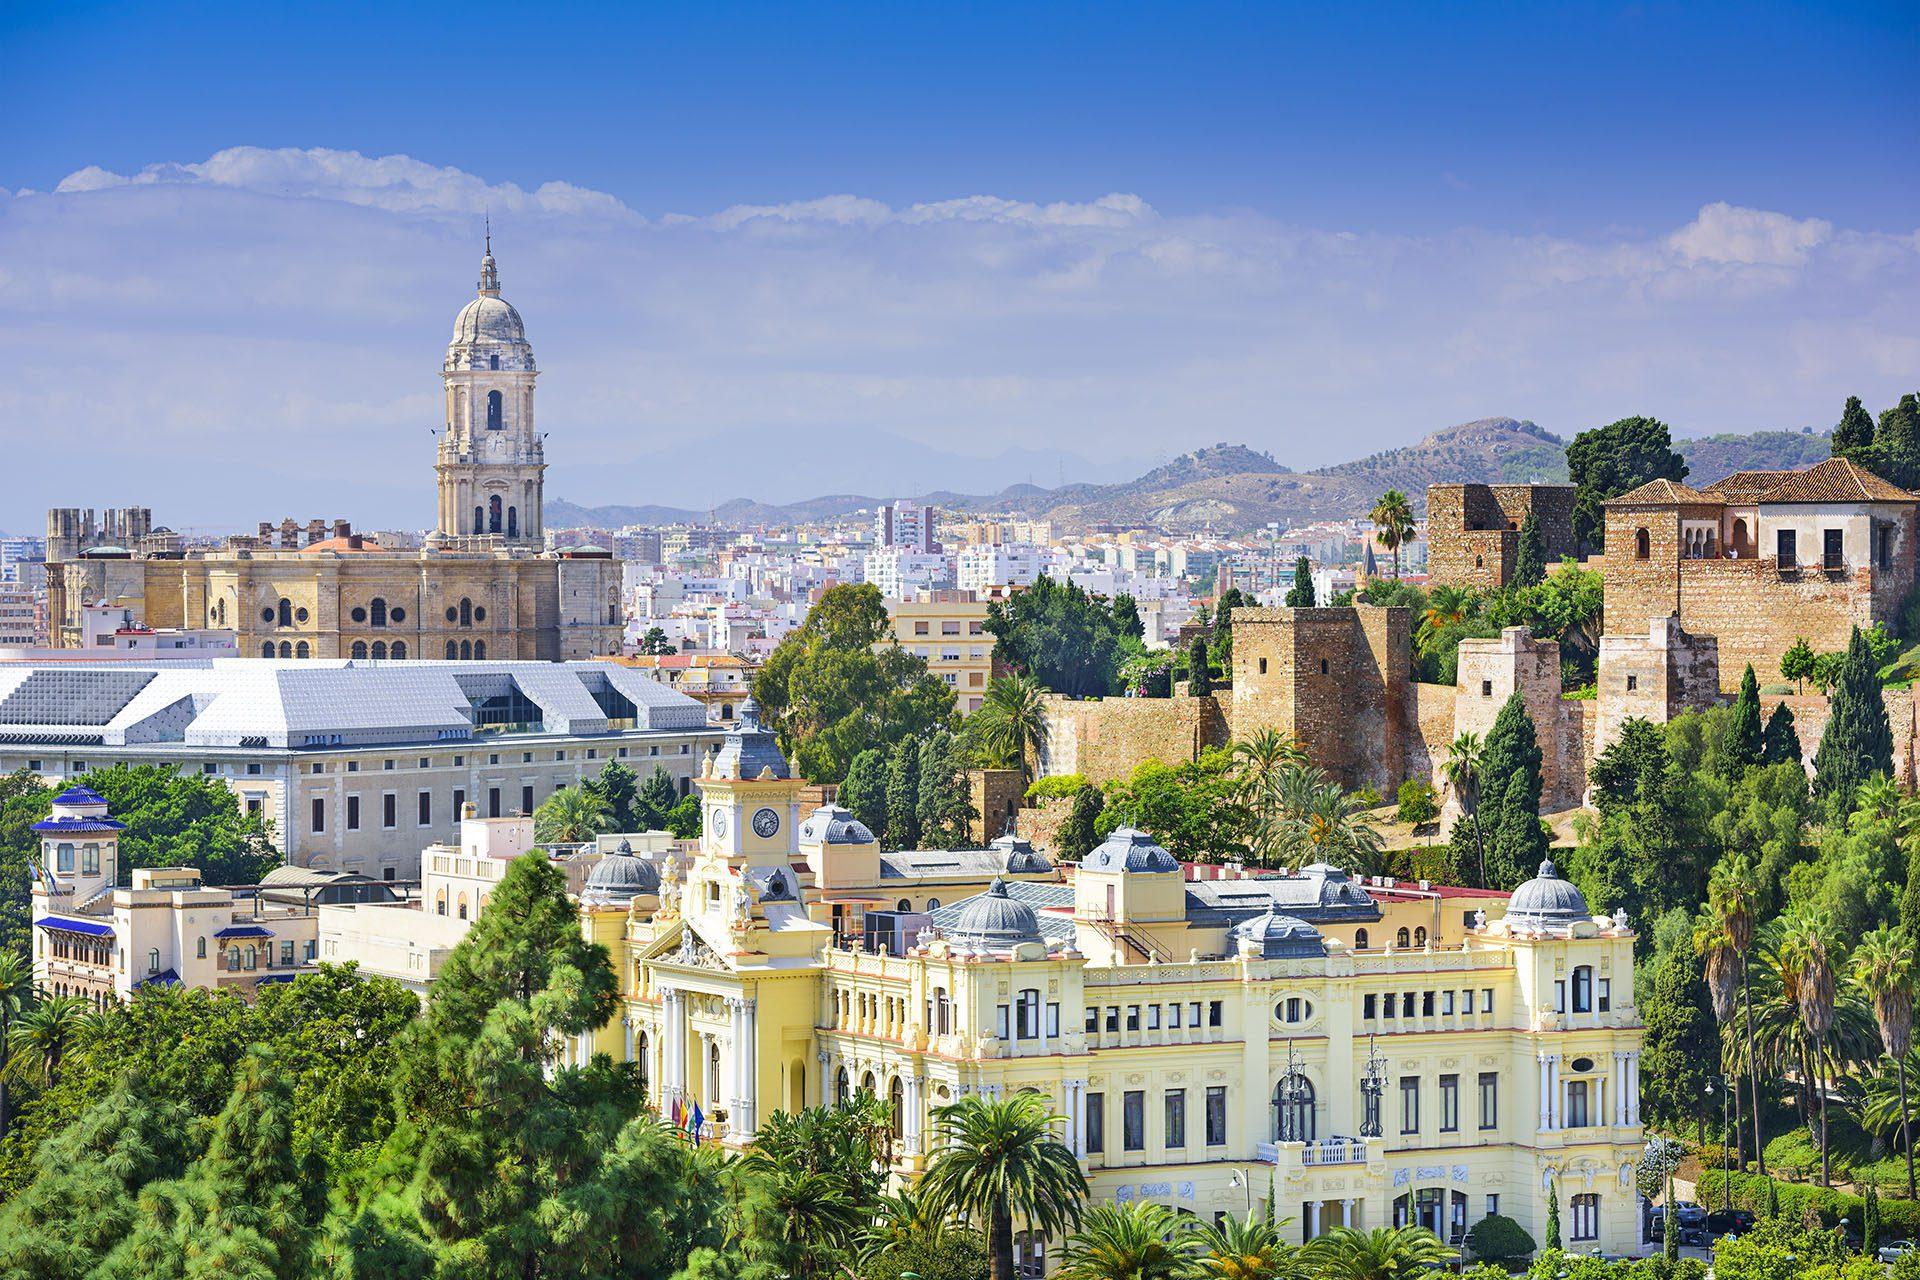 Visite gay de Malaga